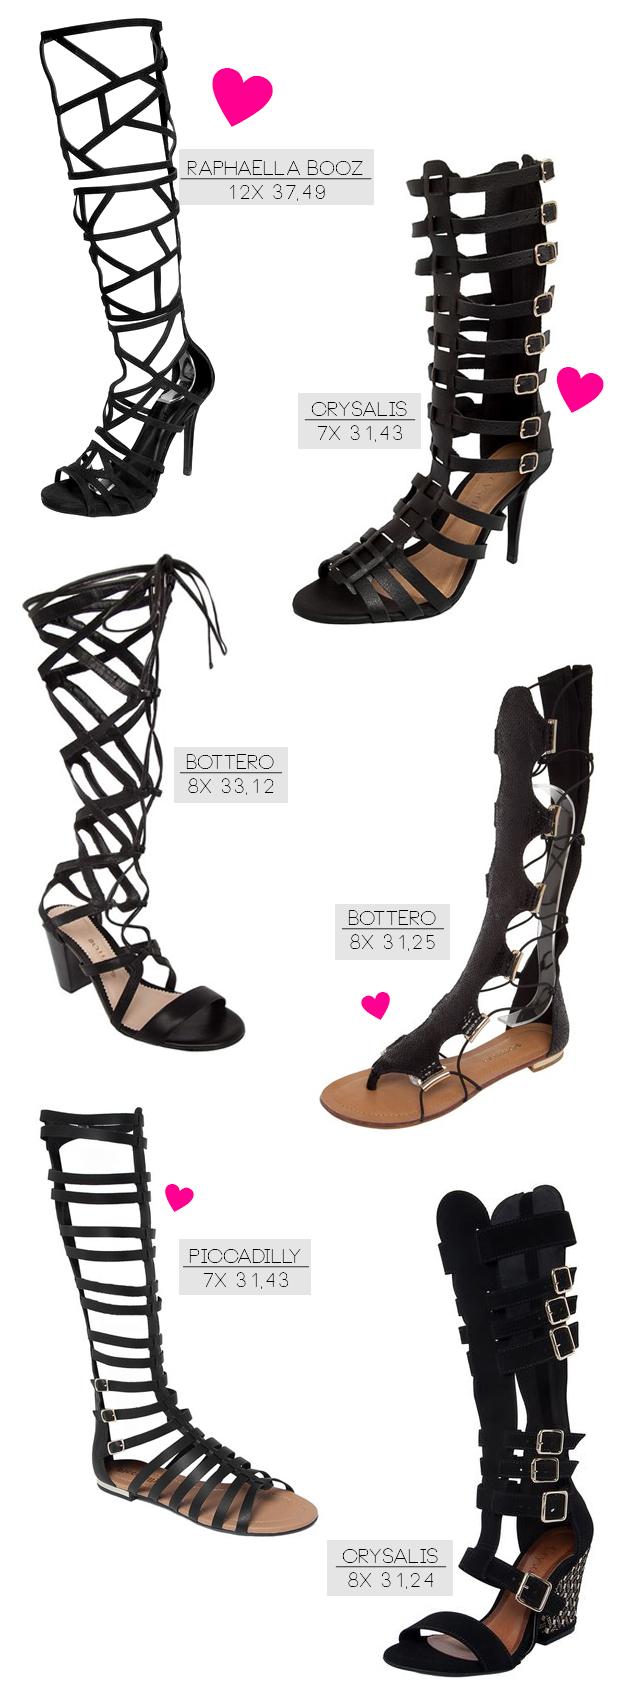 onde-comprar-sandalia-gladiadora-demi-lovato-cool-for-the-summer-blog-got-sin-dafiti-loja-online-10